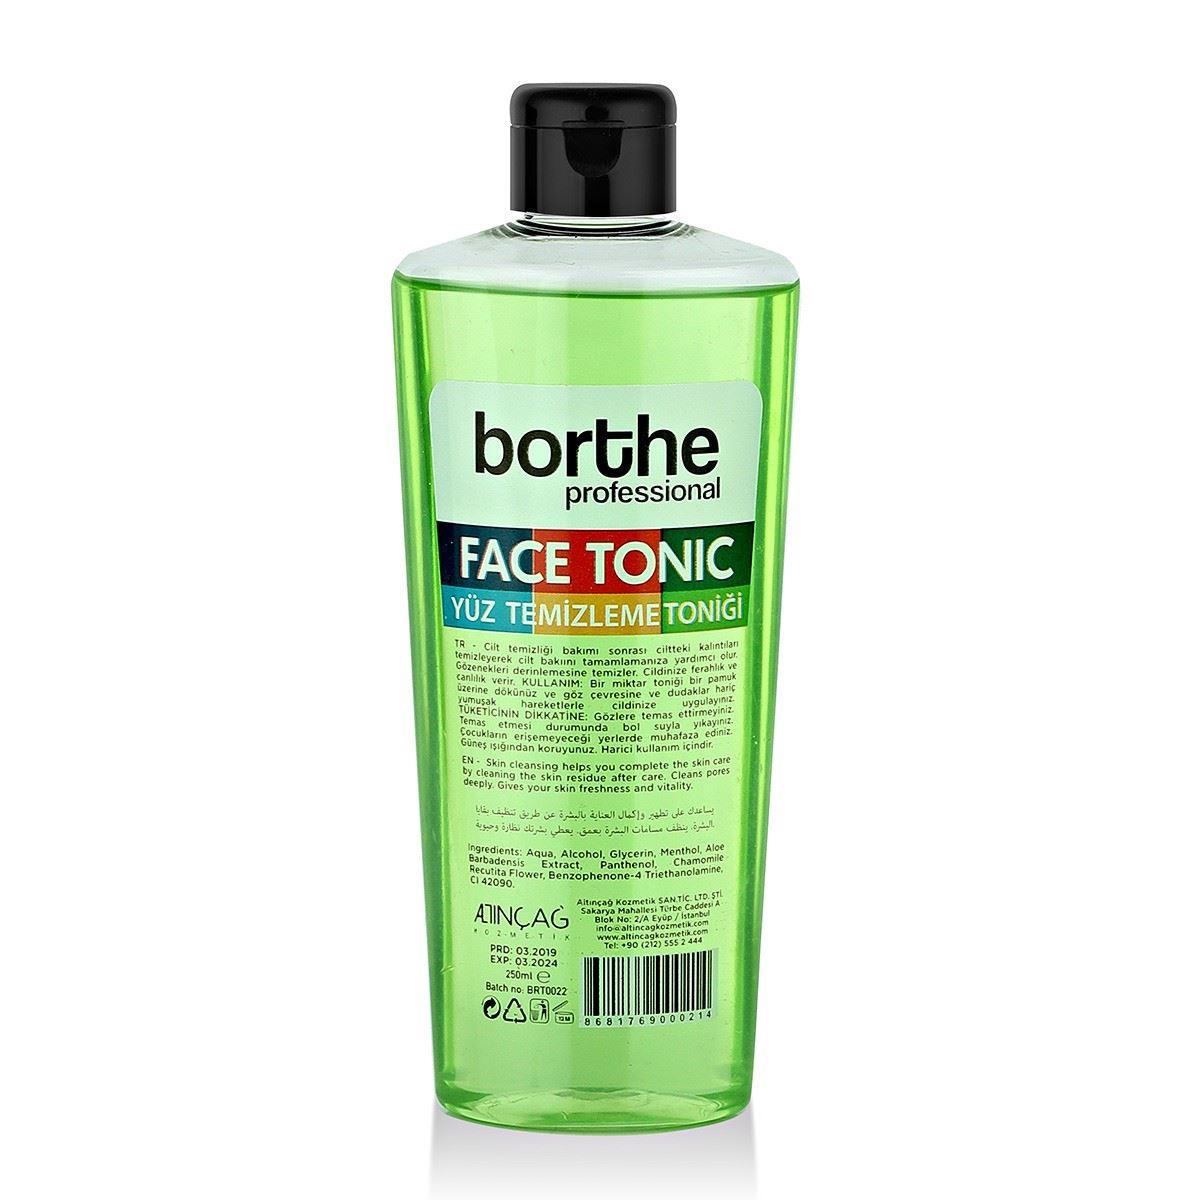 Borthe Yeşil Yüz Toniği 250 ml.